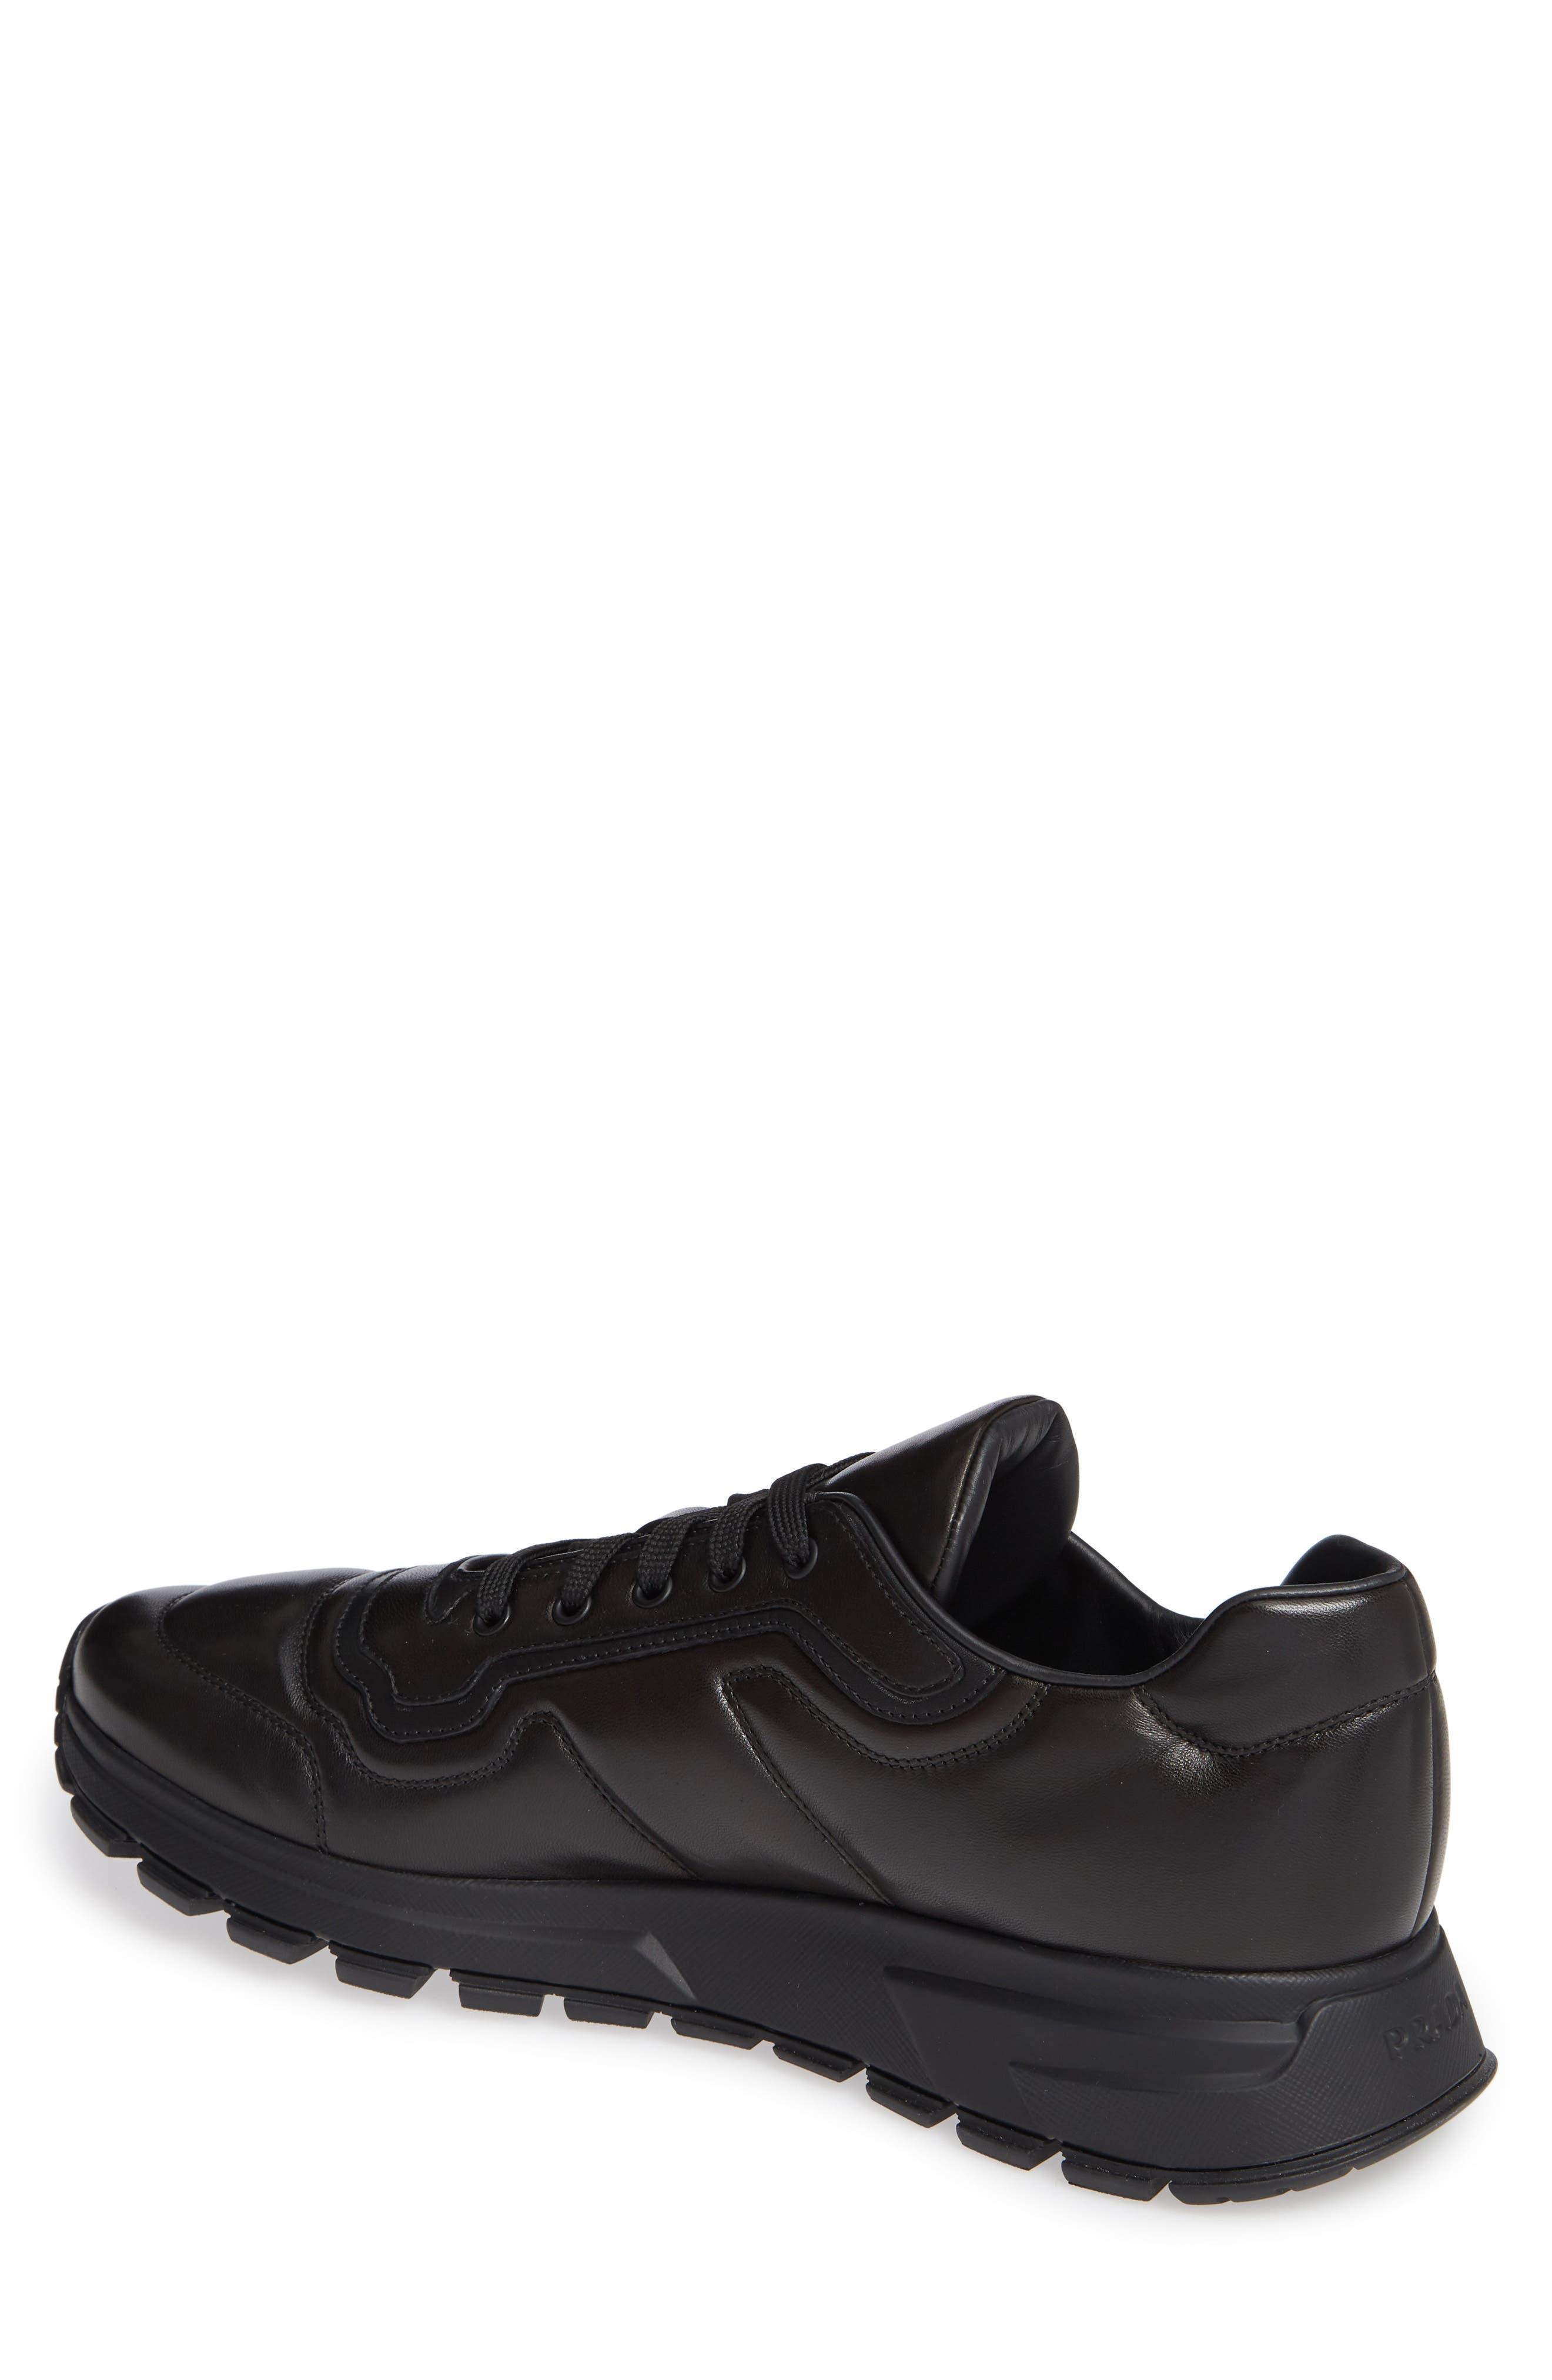 PRADA,                             Trainer Sneaker,                             Alternate thumbnail 2, color,                             NERO